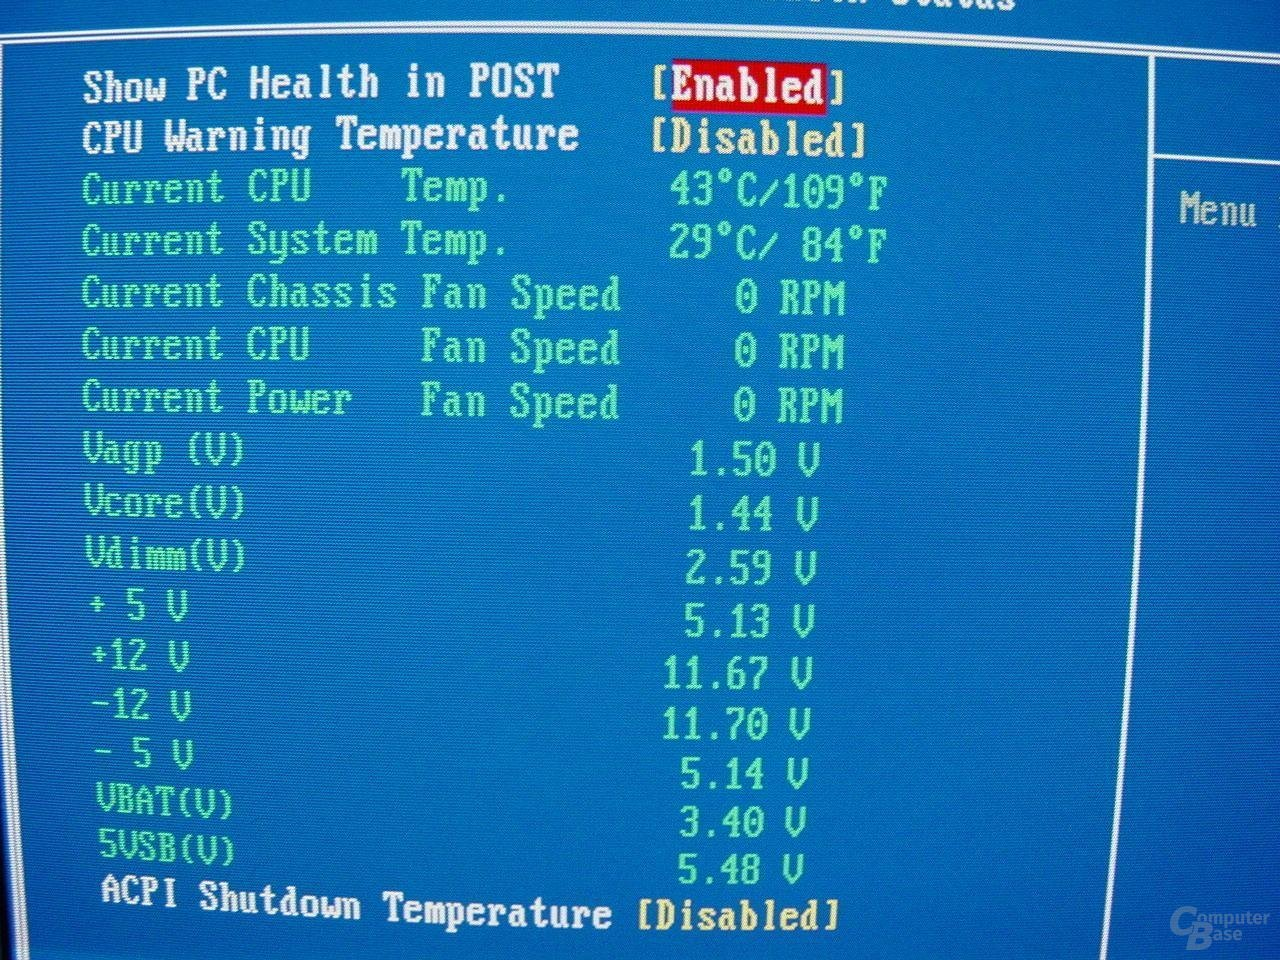 EP-4GEAEI - BIOS - Health